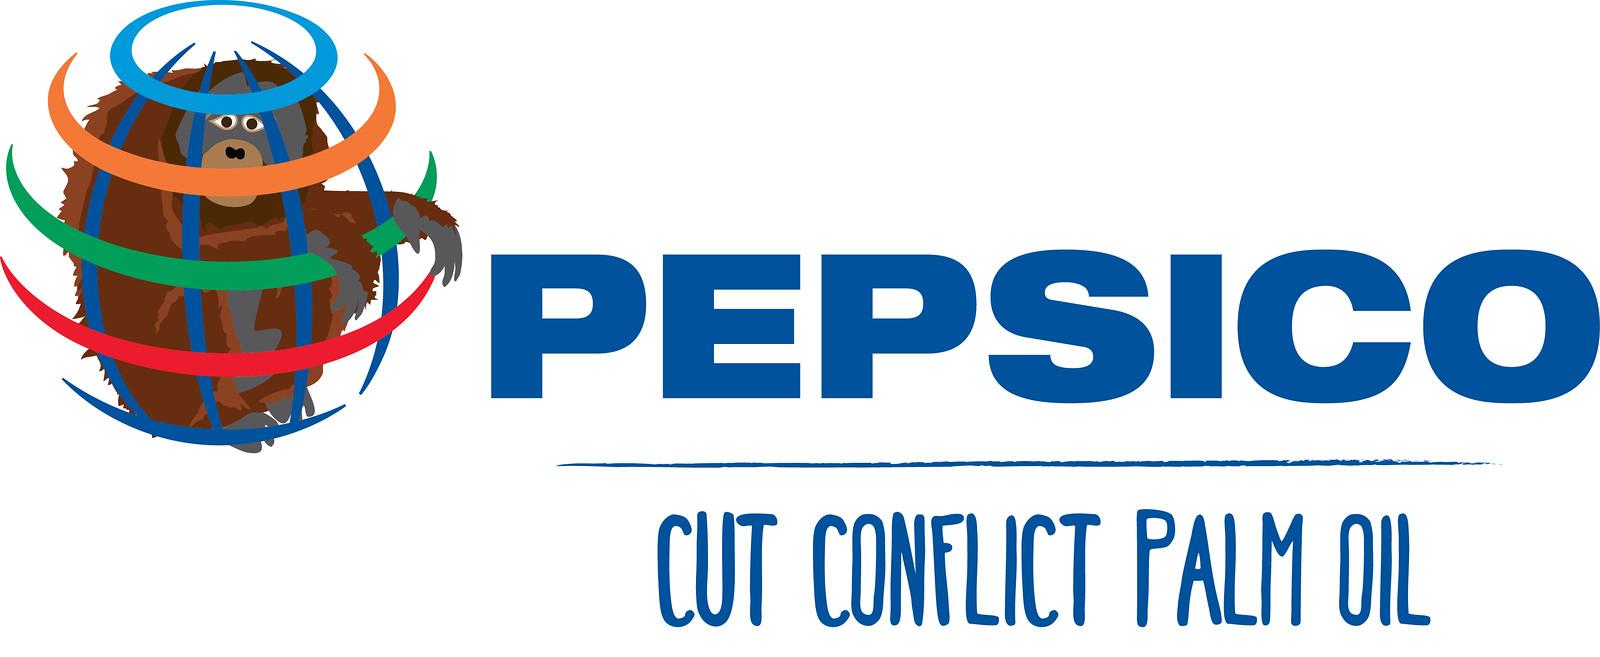 Pepsico_cage_rd3.4.jpg